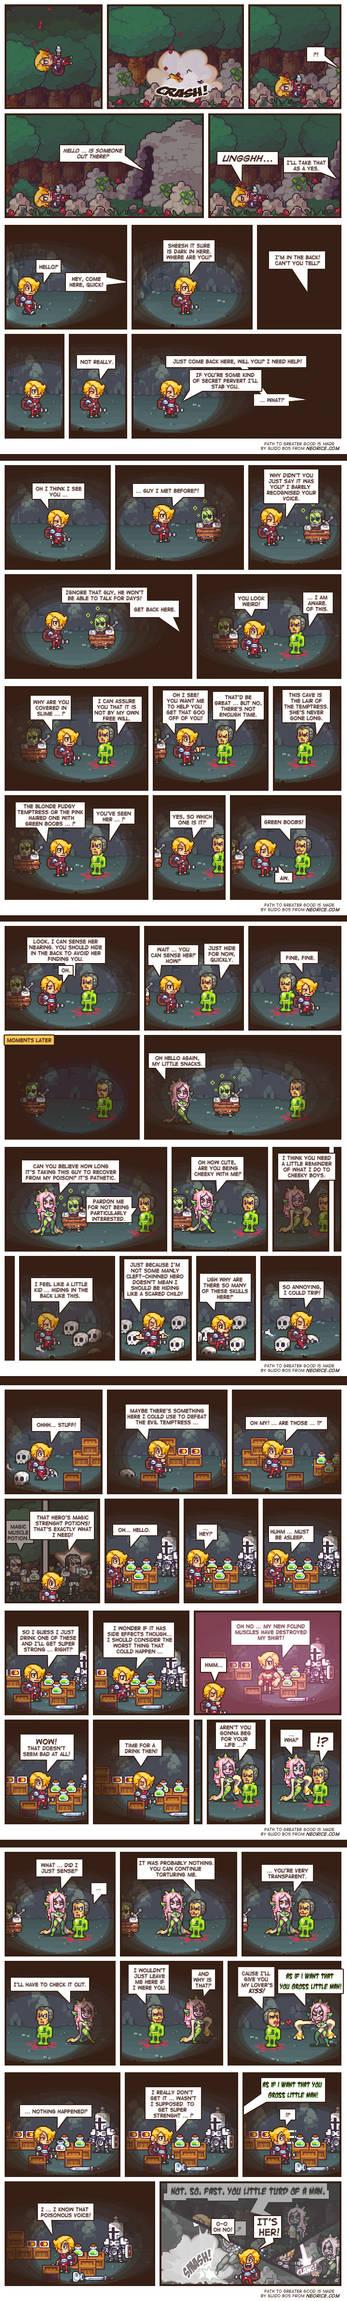 TOM RPG page 51-60